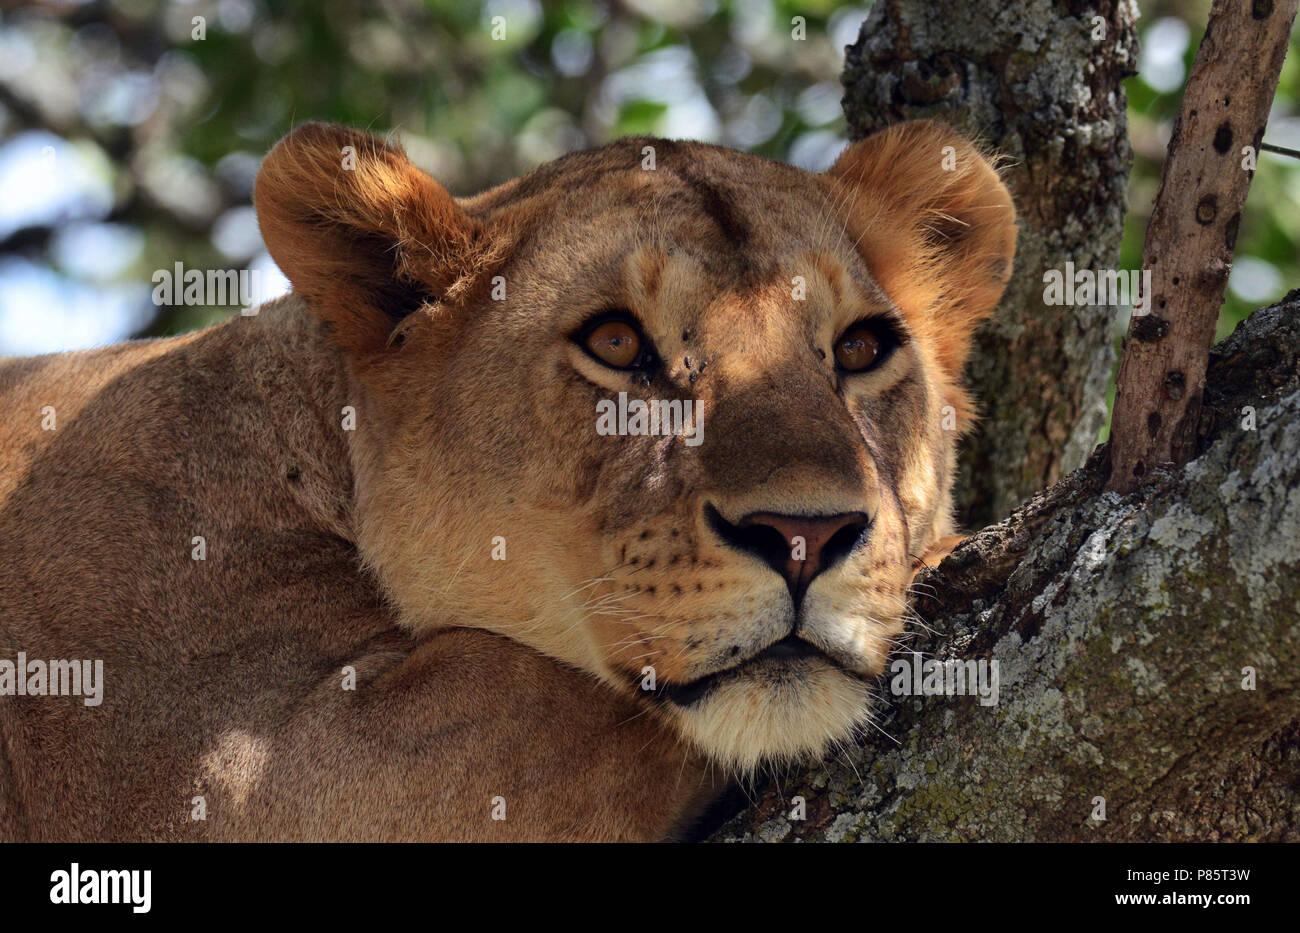 Afrikaanse Leeuw in boom, African Lion in tree - Stock Image